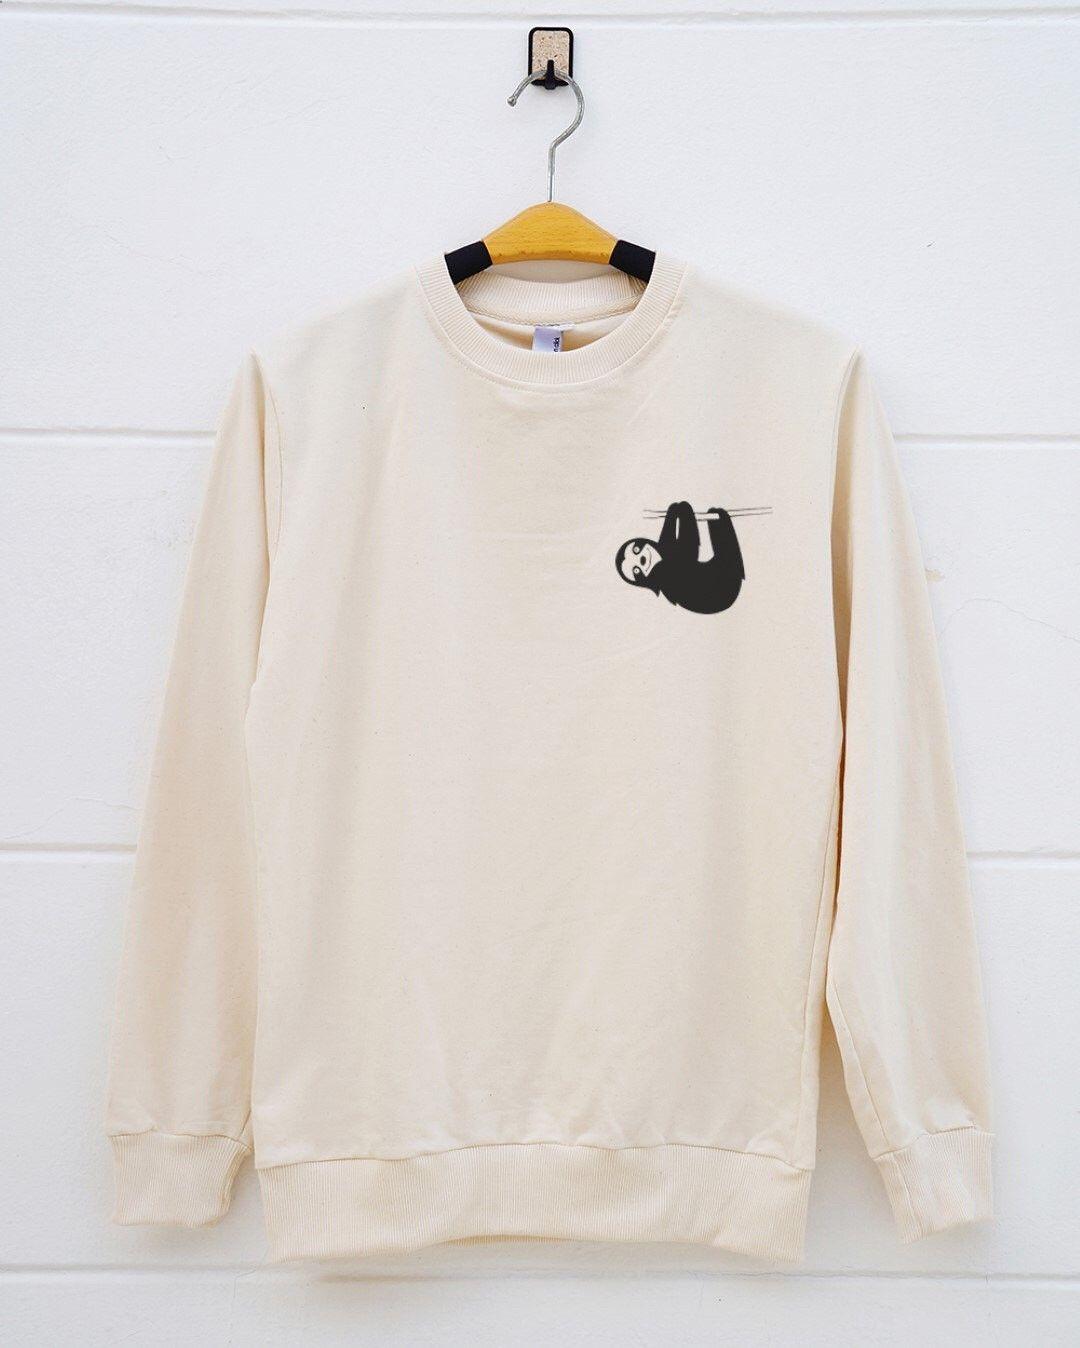 Pocket shirts sloth shirts . animal funny sloth tee shirts tumblr ...